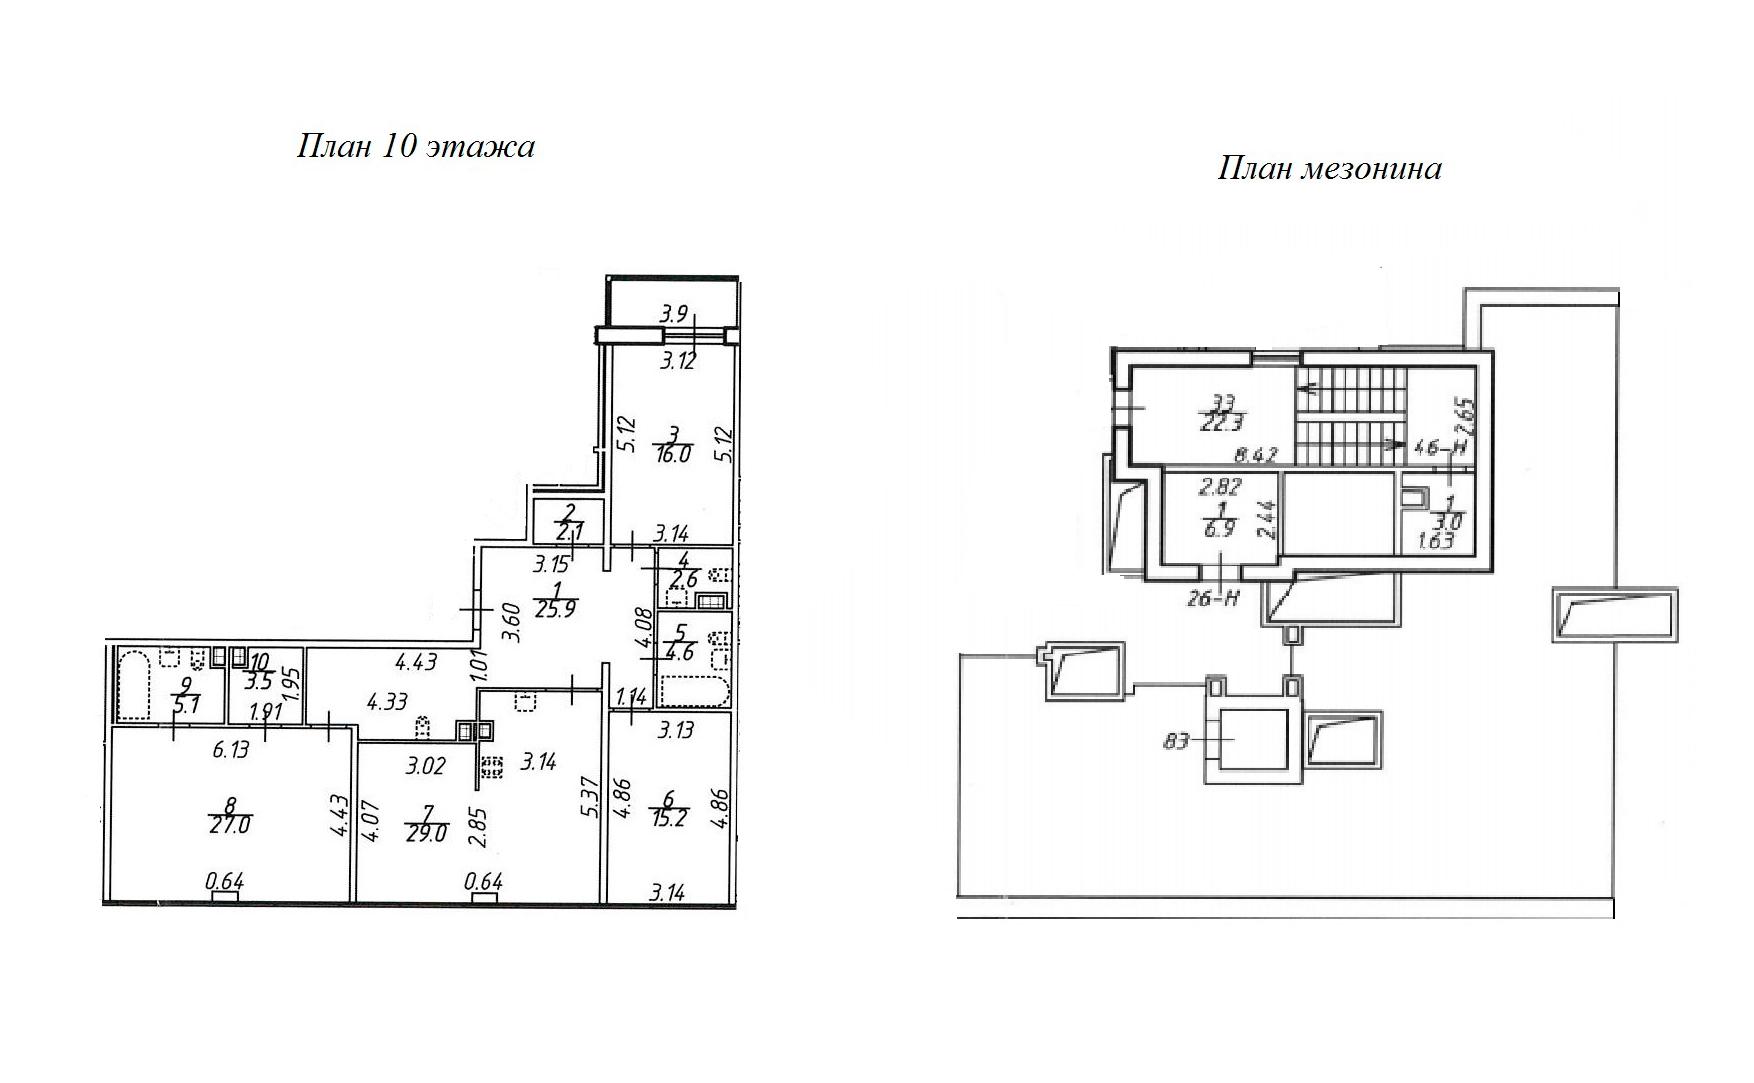 4Е-комнатная квартира, 168.04 м², 10 этаж – Планировка